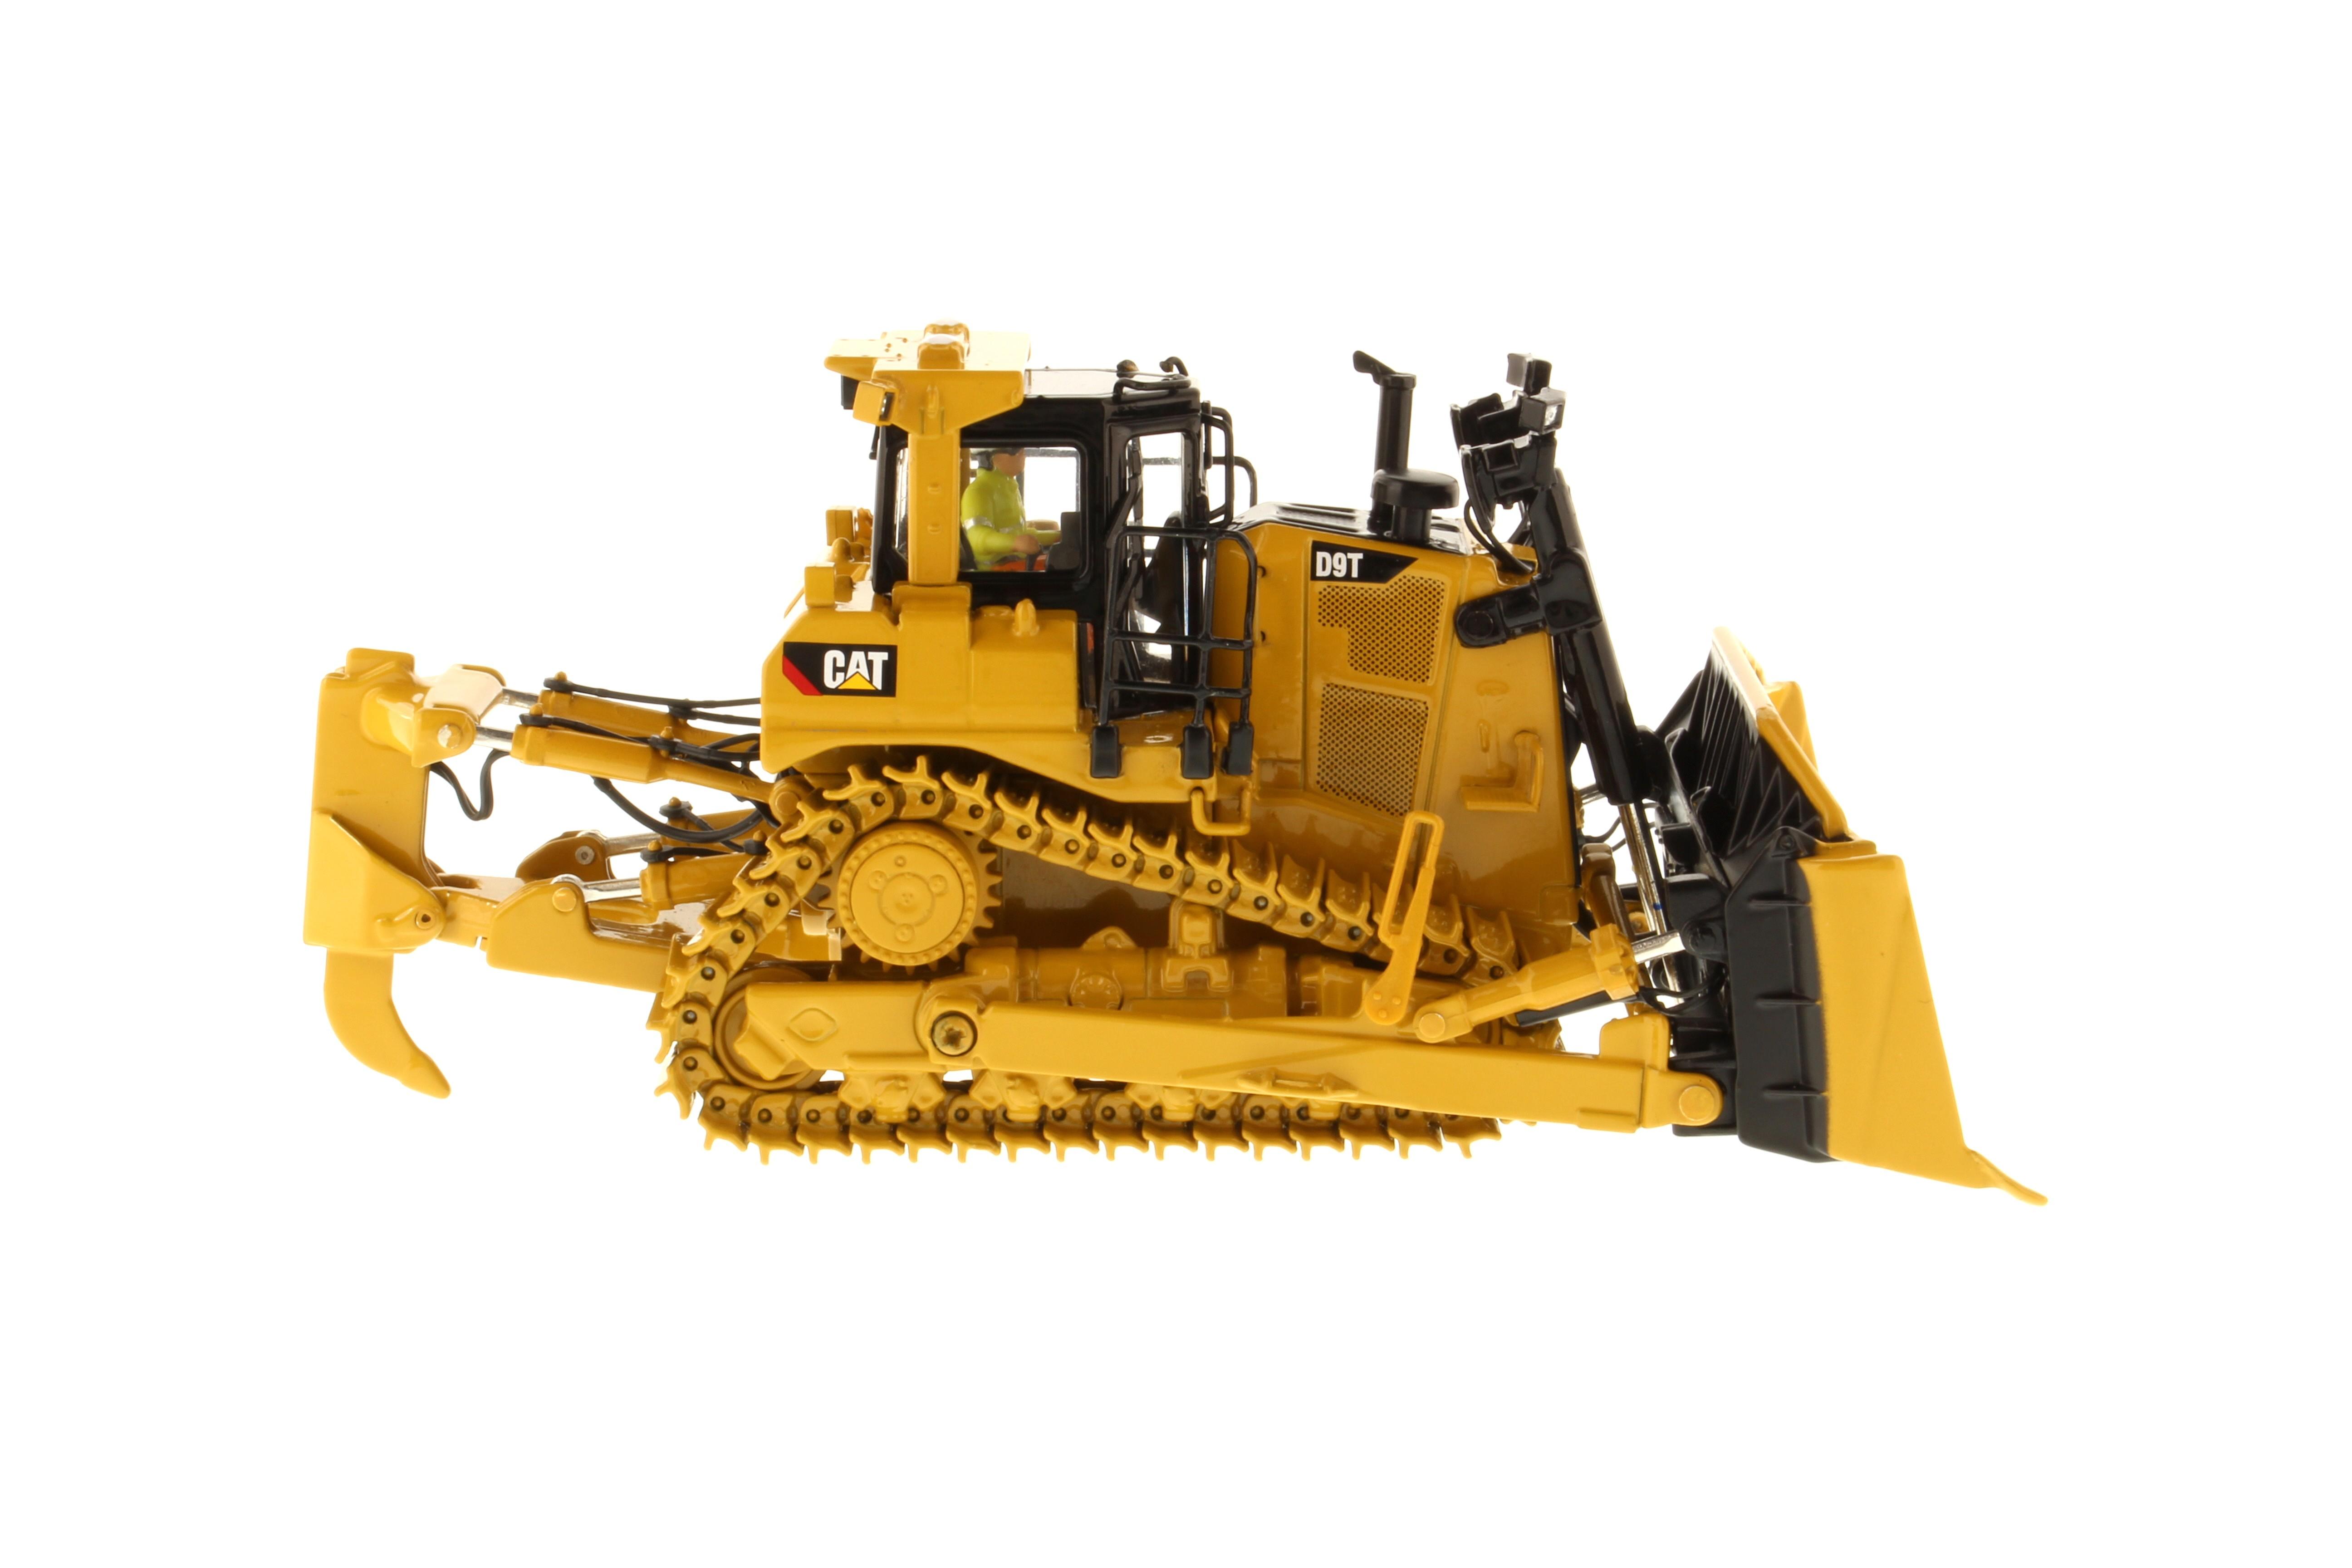 Caterpillar D9t Track Type Tractor Dozer